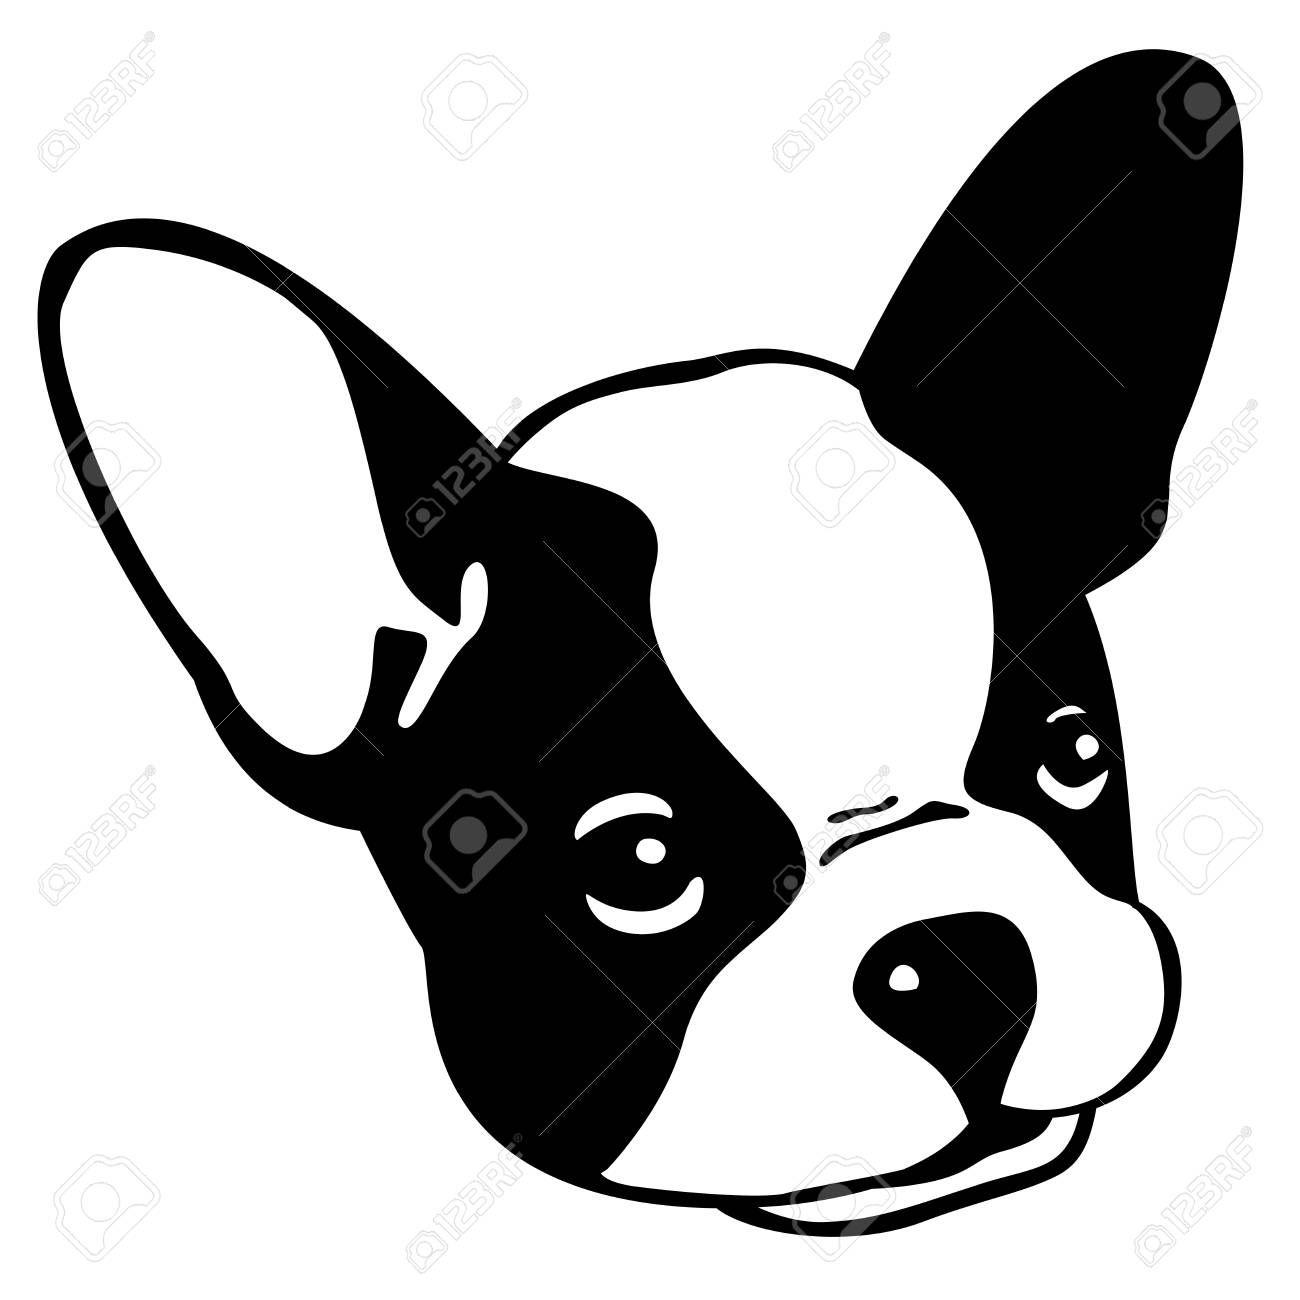 Dog French Bulldog Vector Icon Head Face Illustration Face Illustration Illustration Bulldog